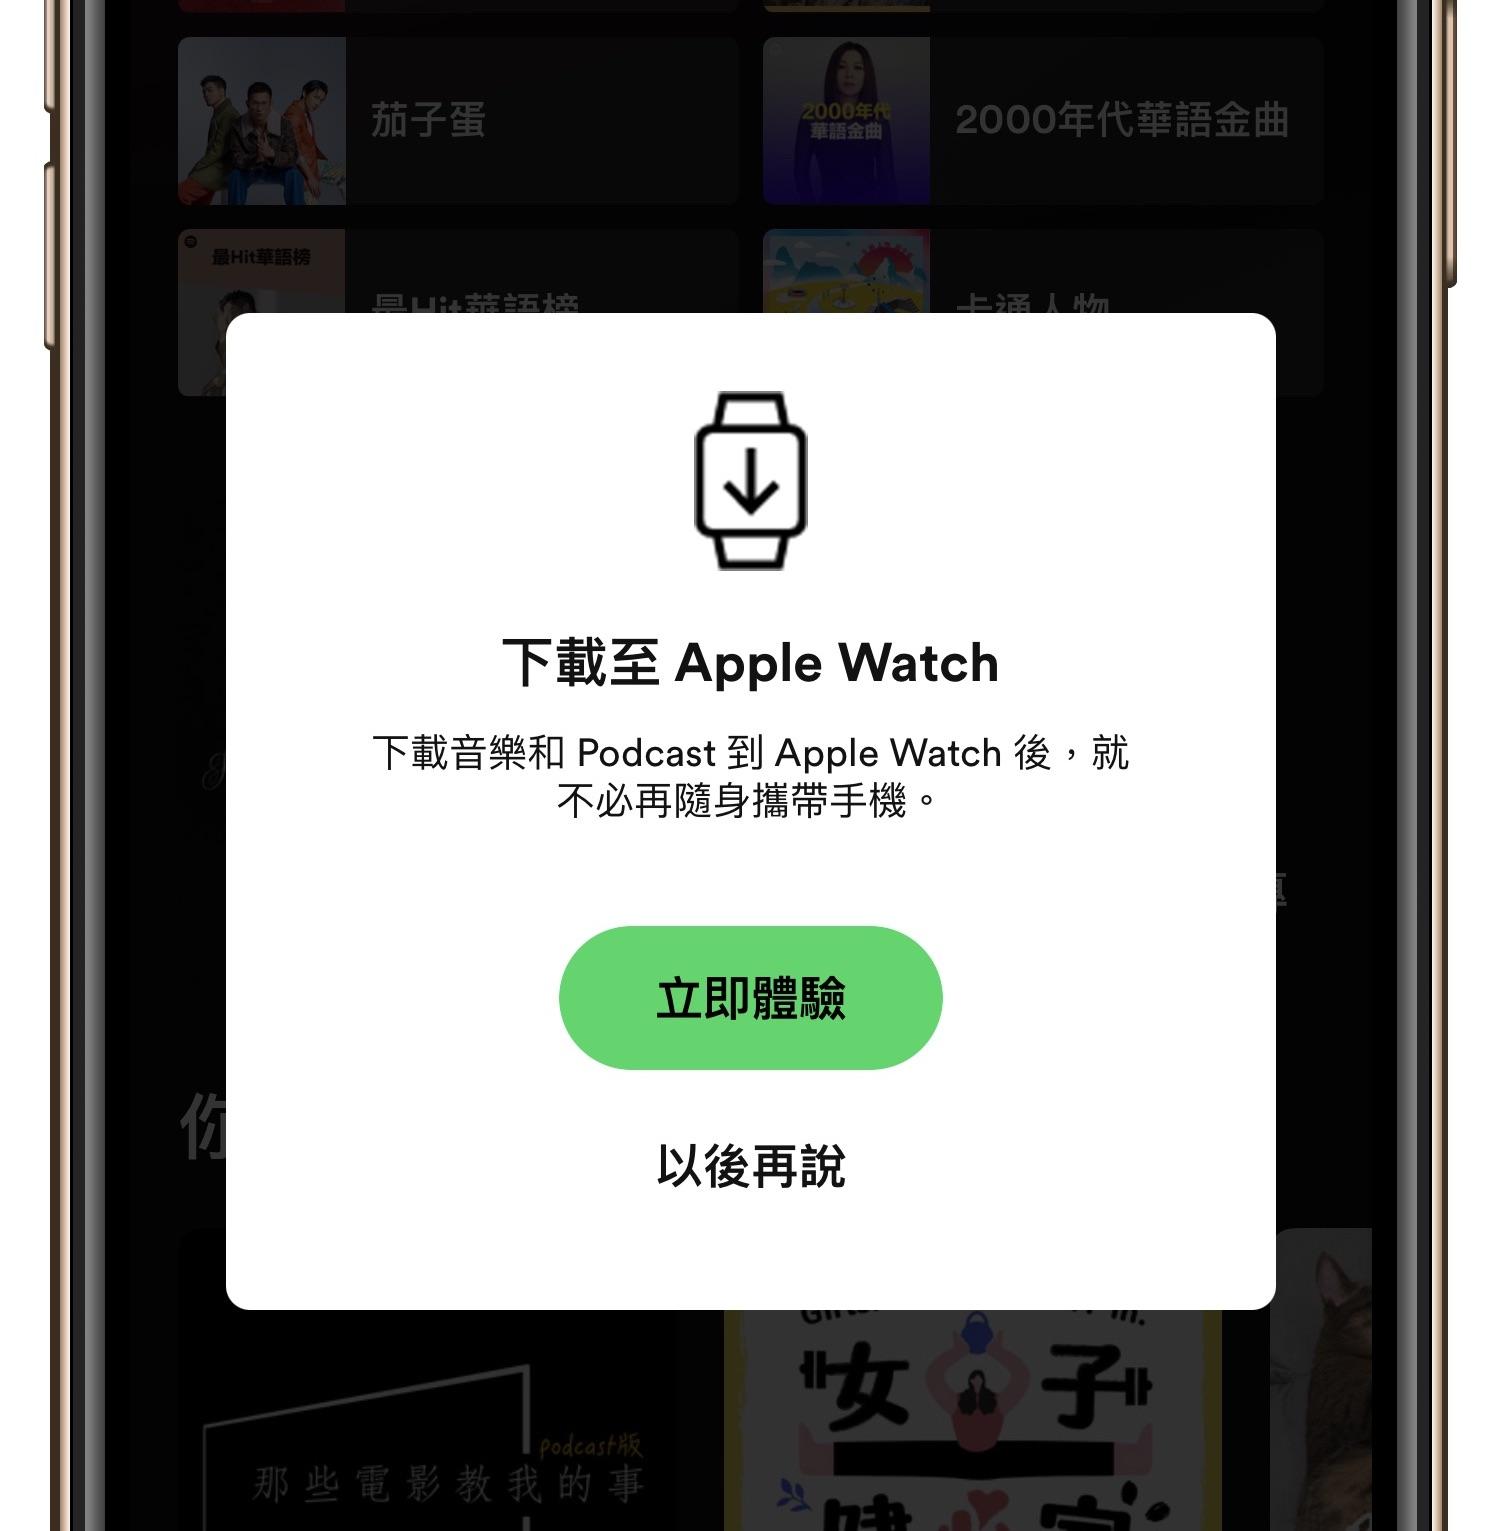 Spotify 支援 Apple Watch 離線播放